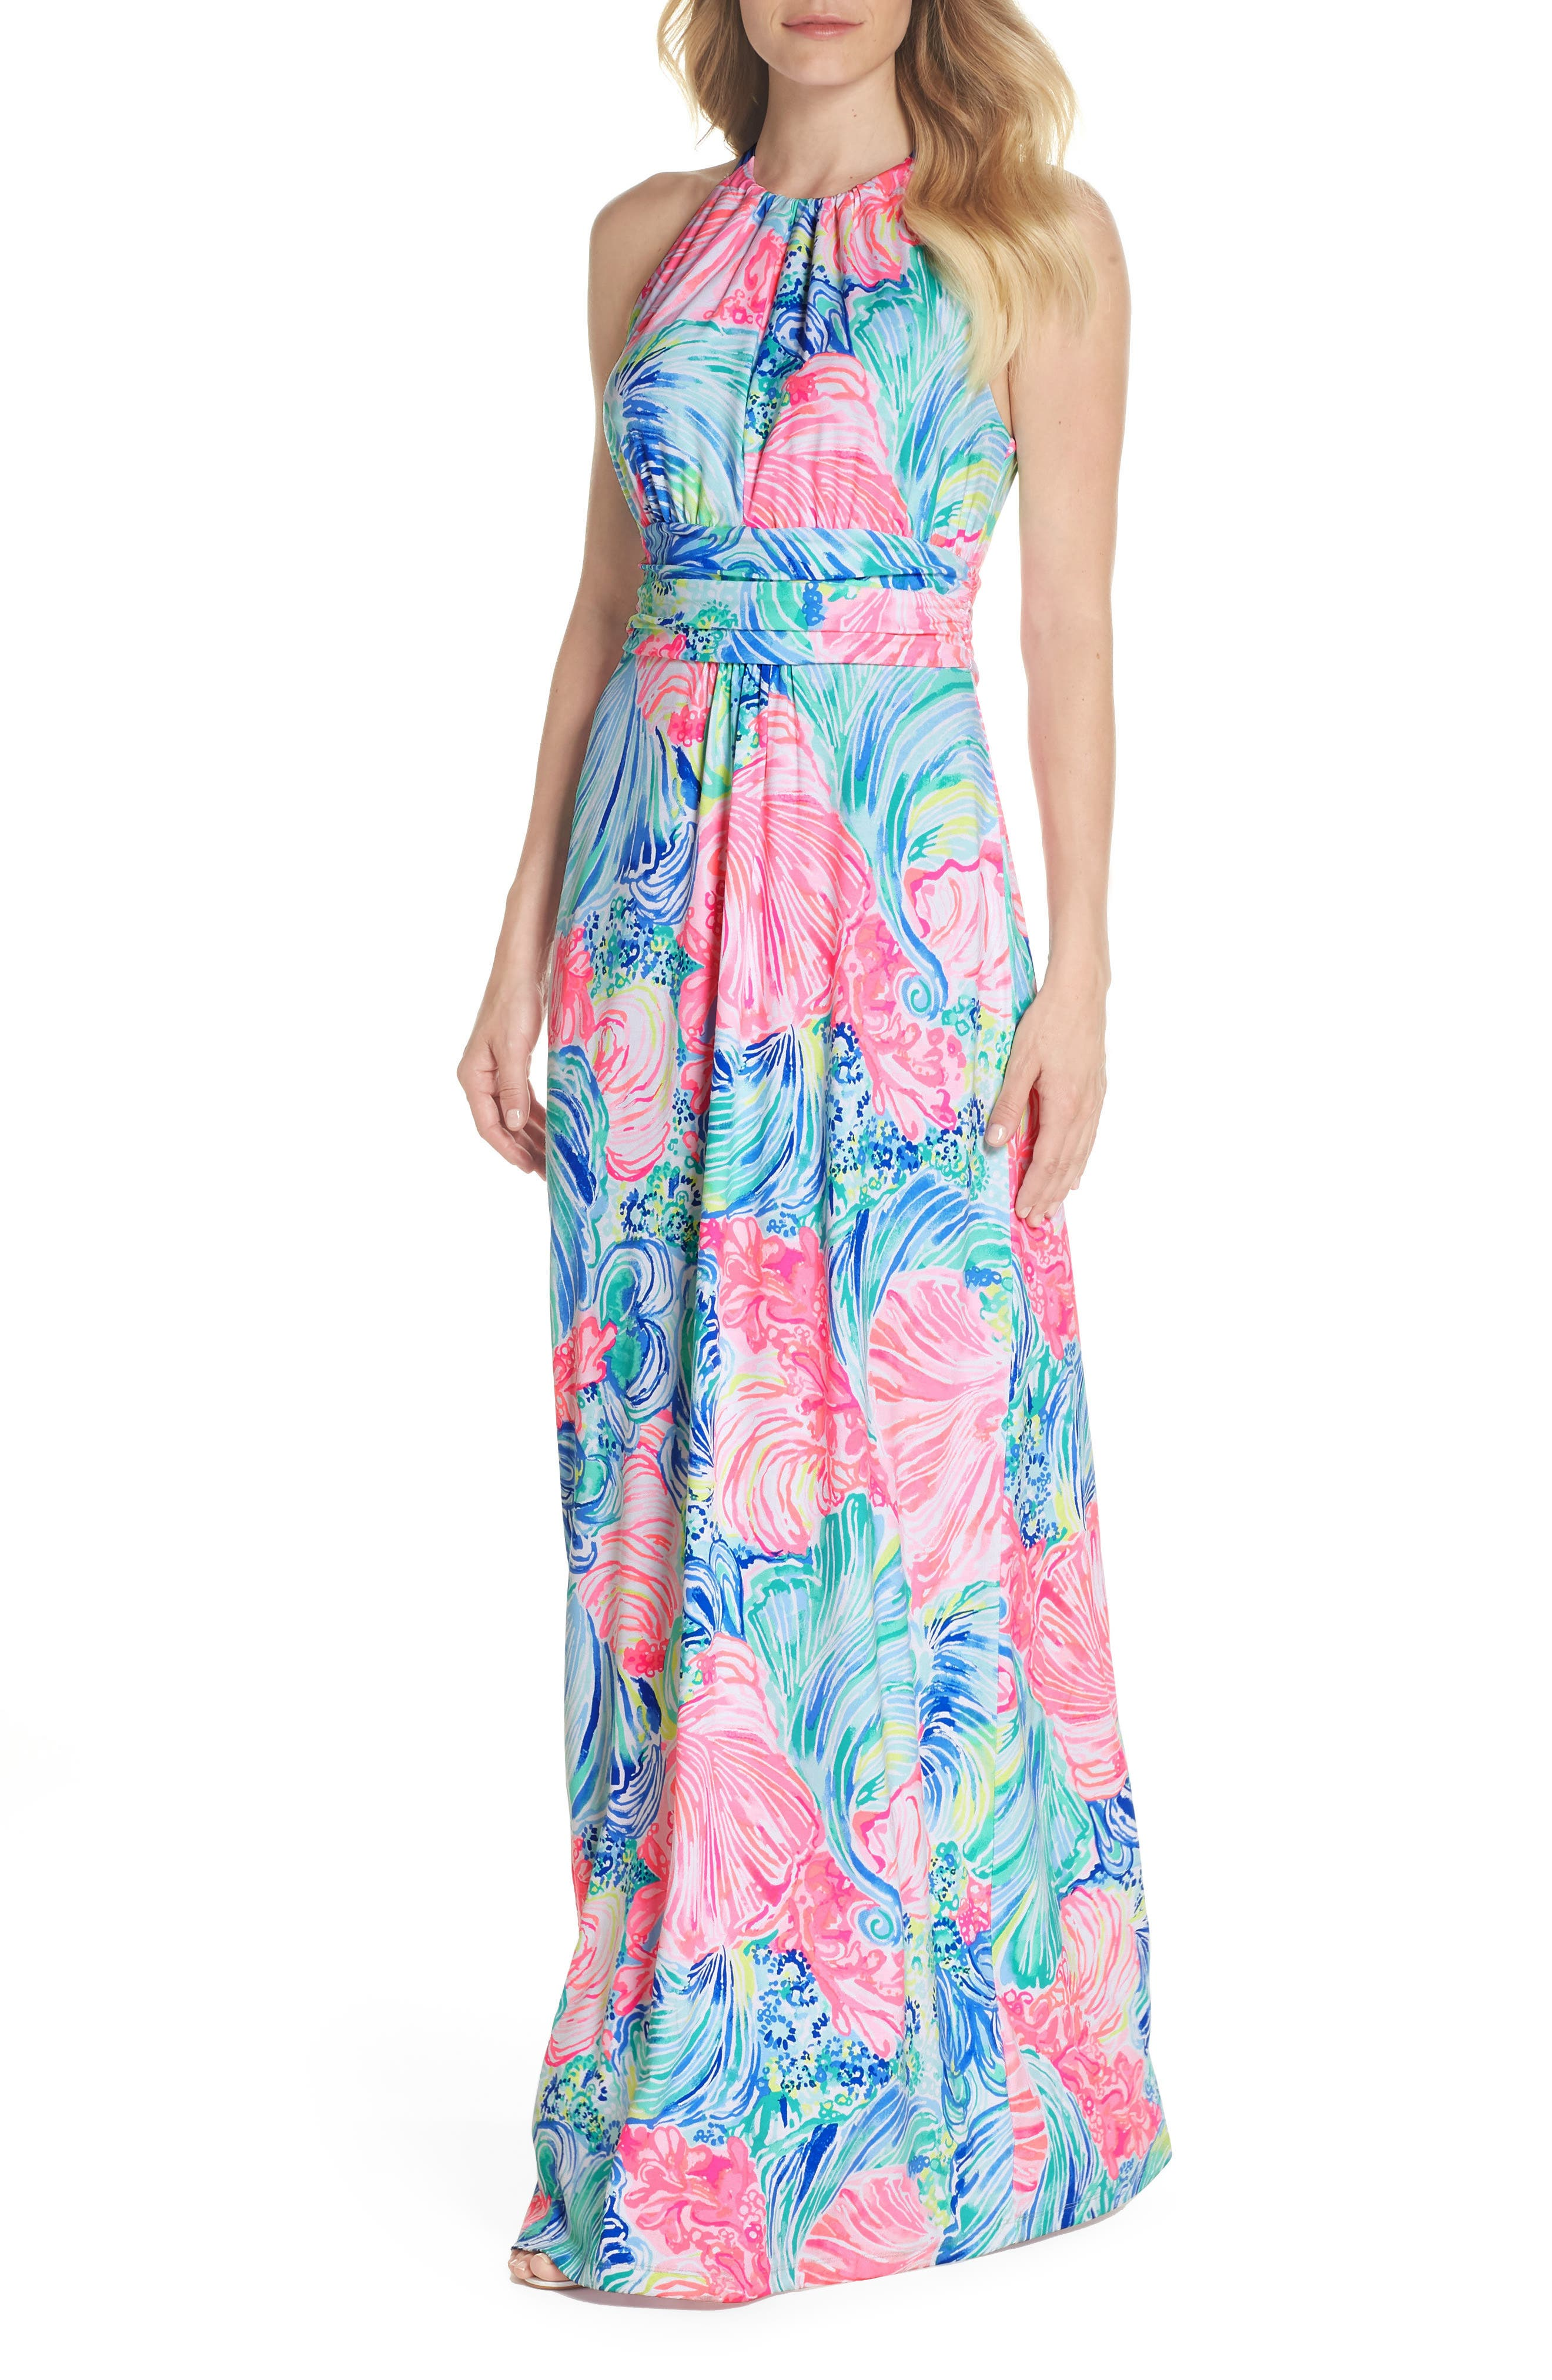 Lilly Pulitzer Martina Maxi Dress, Pink